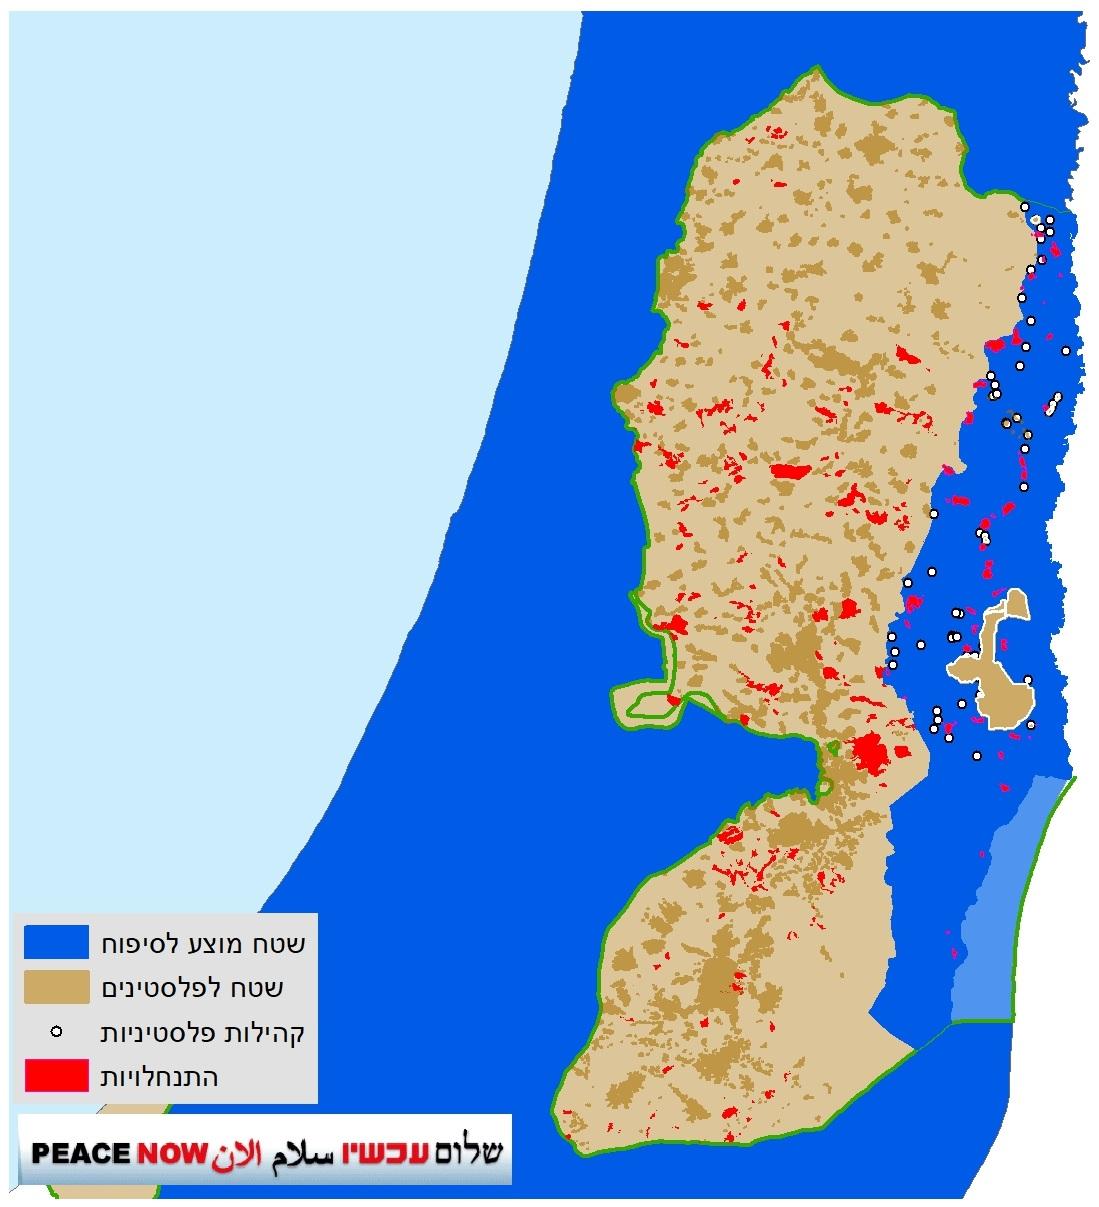 Data on Netanyahu\'s Jordan Valley Annexation Map - Peace Now